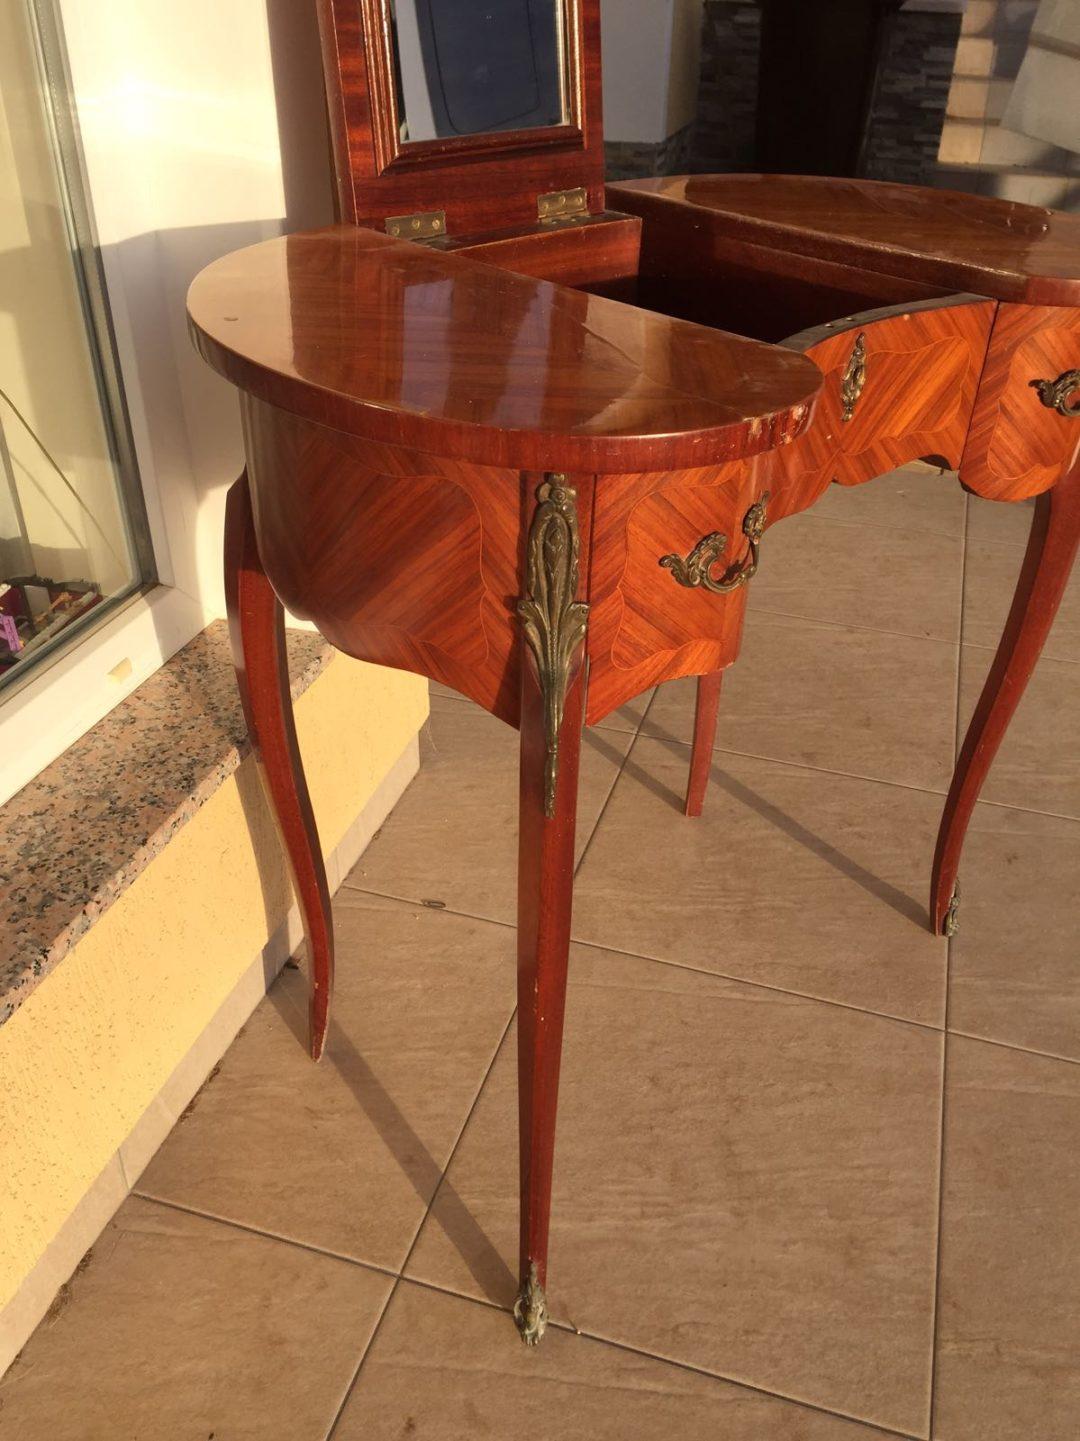 Антикварный дамский столик в стиле Луи XV